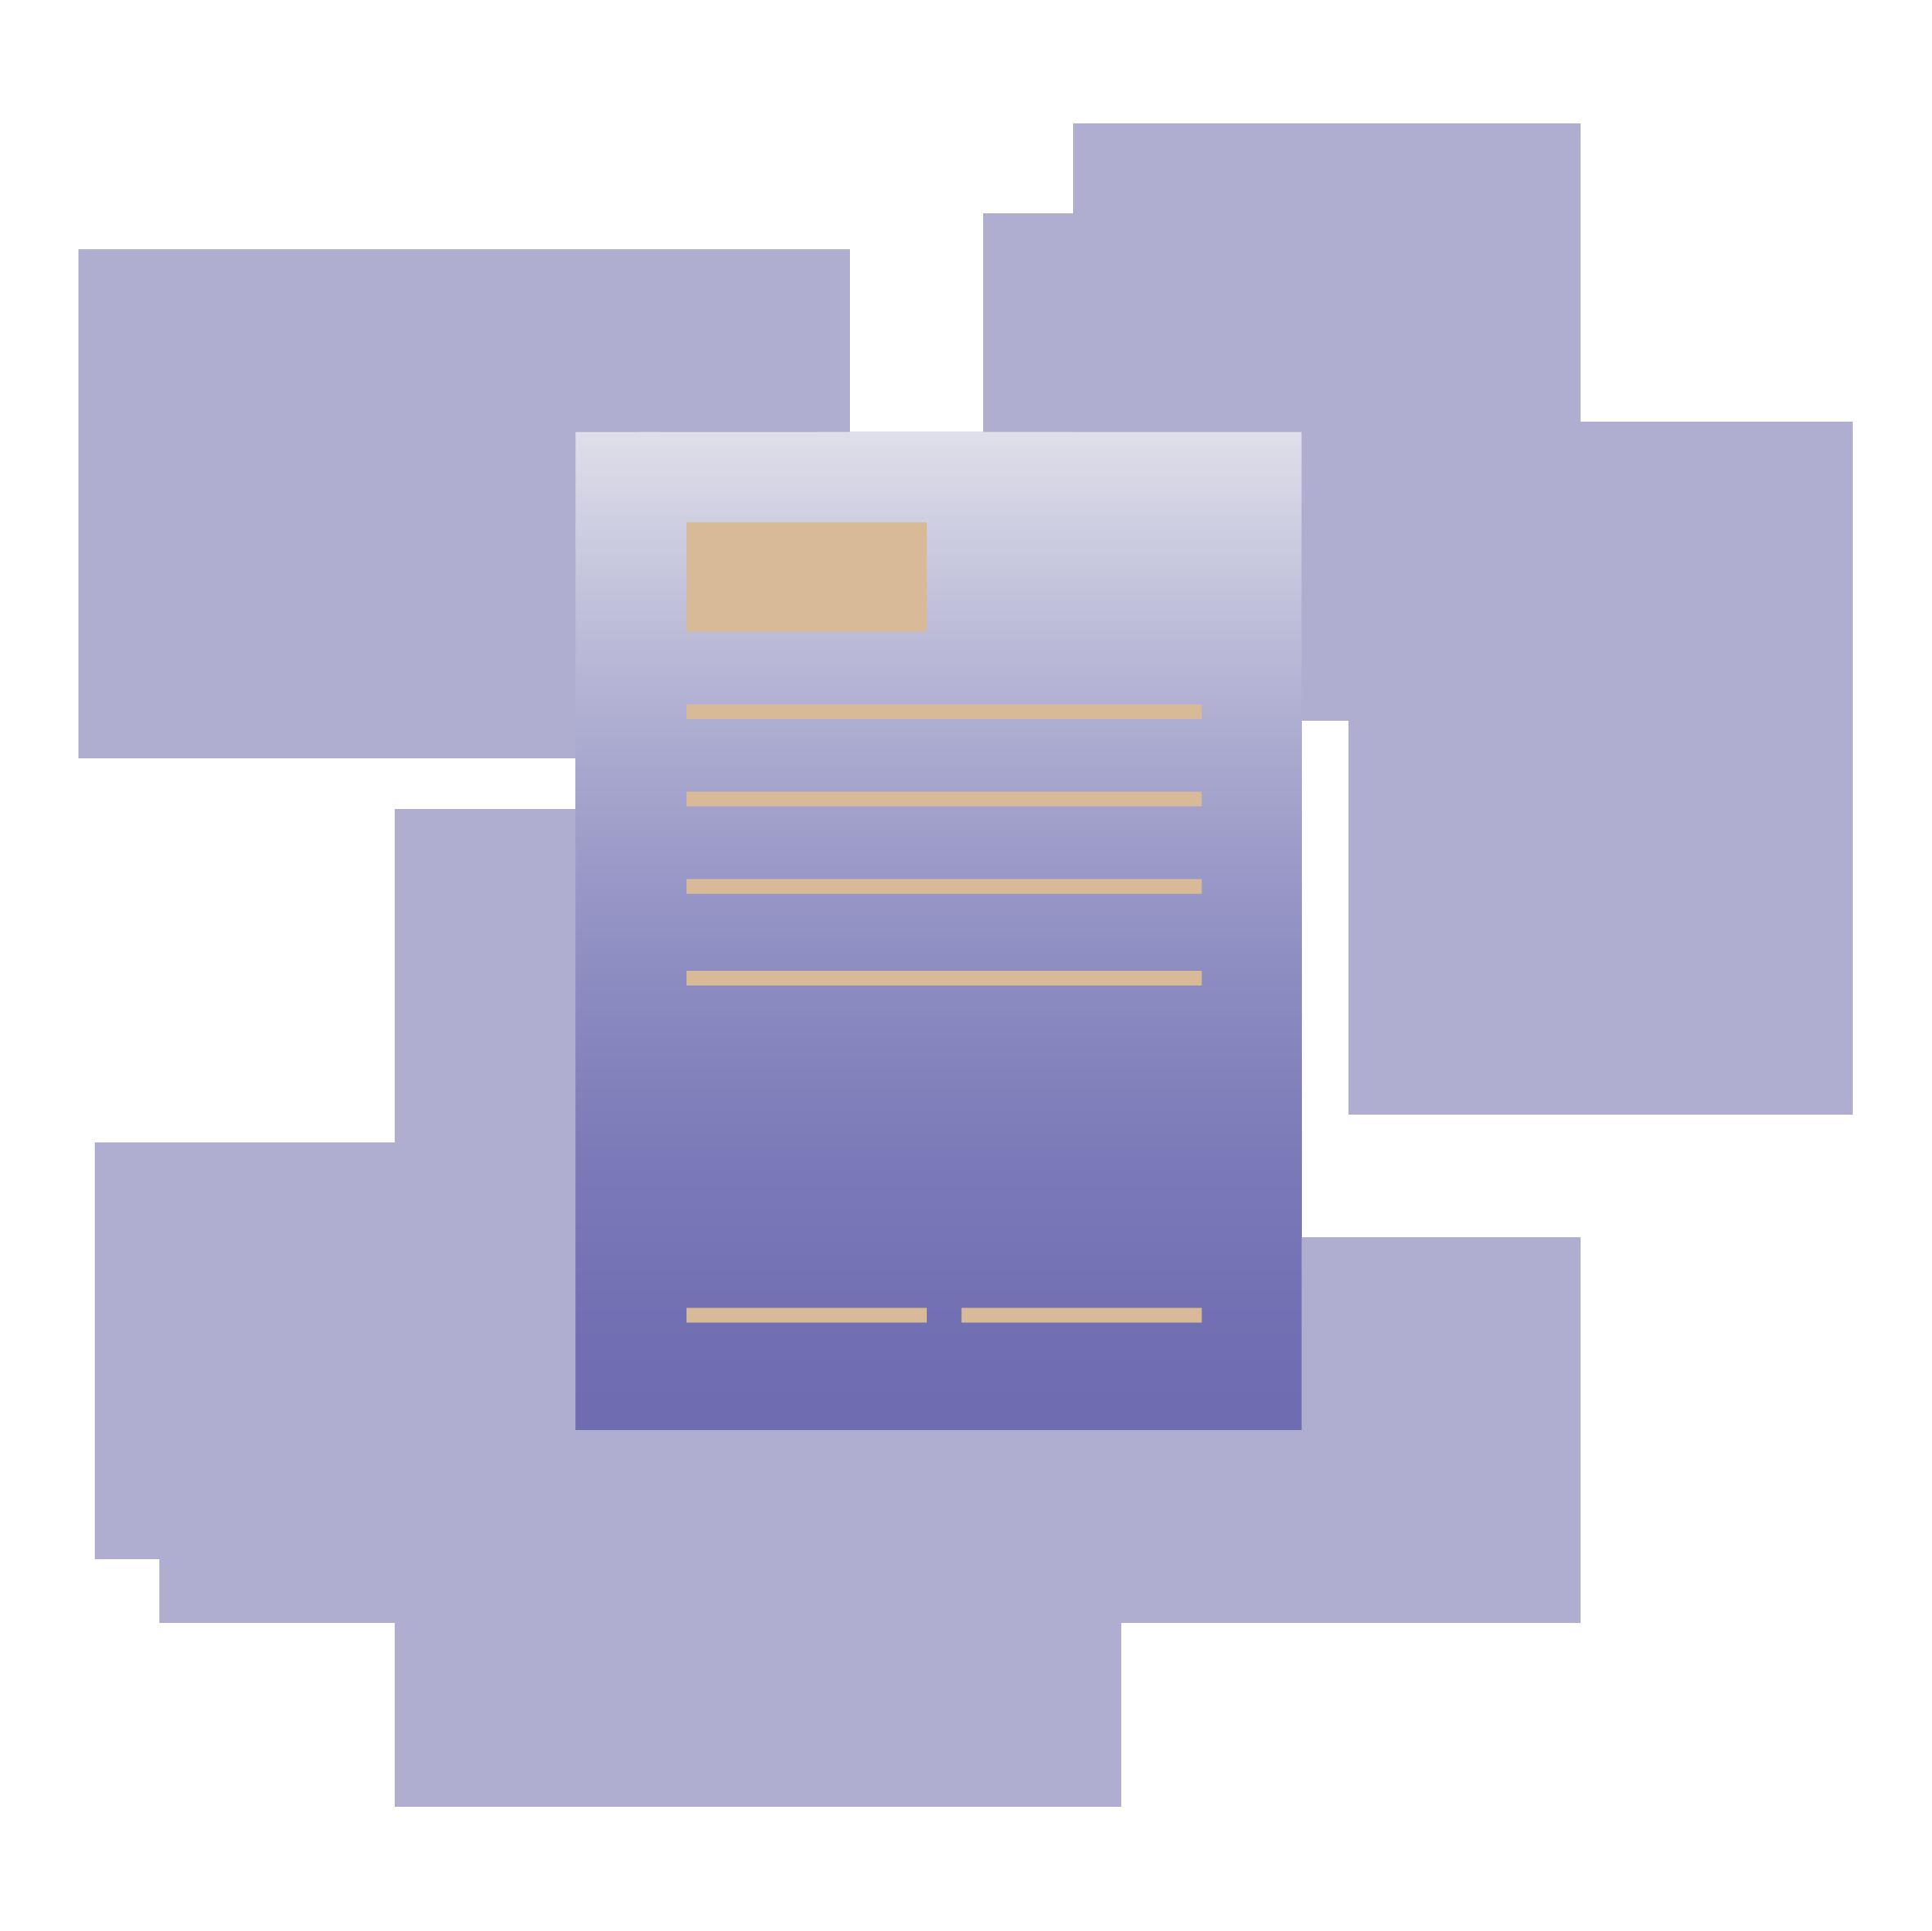 Live document exchange flows tab image